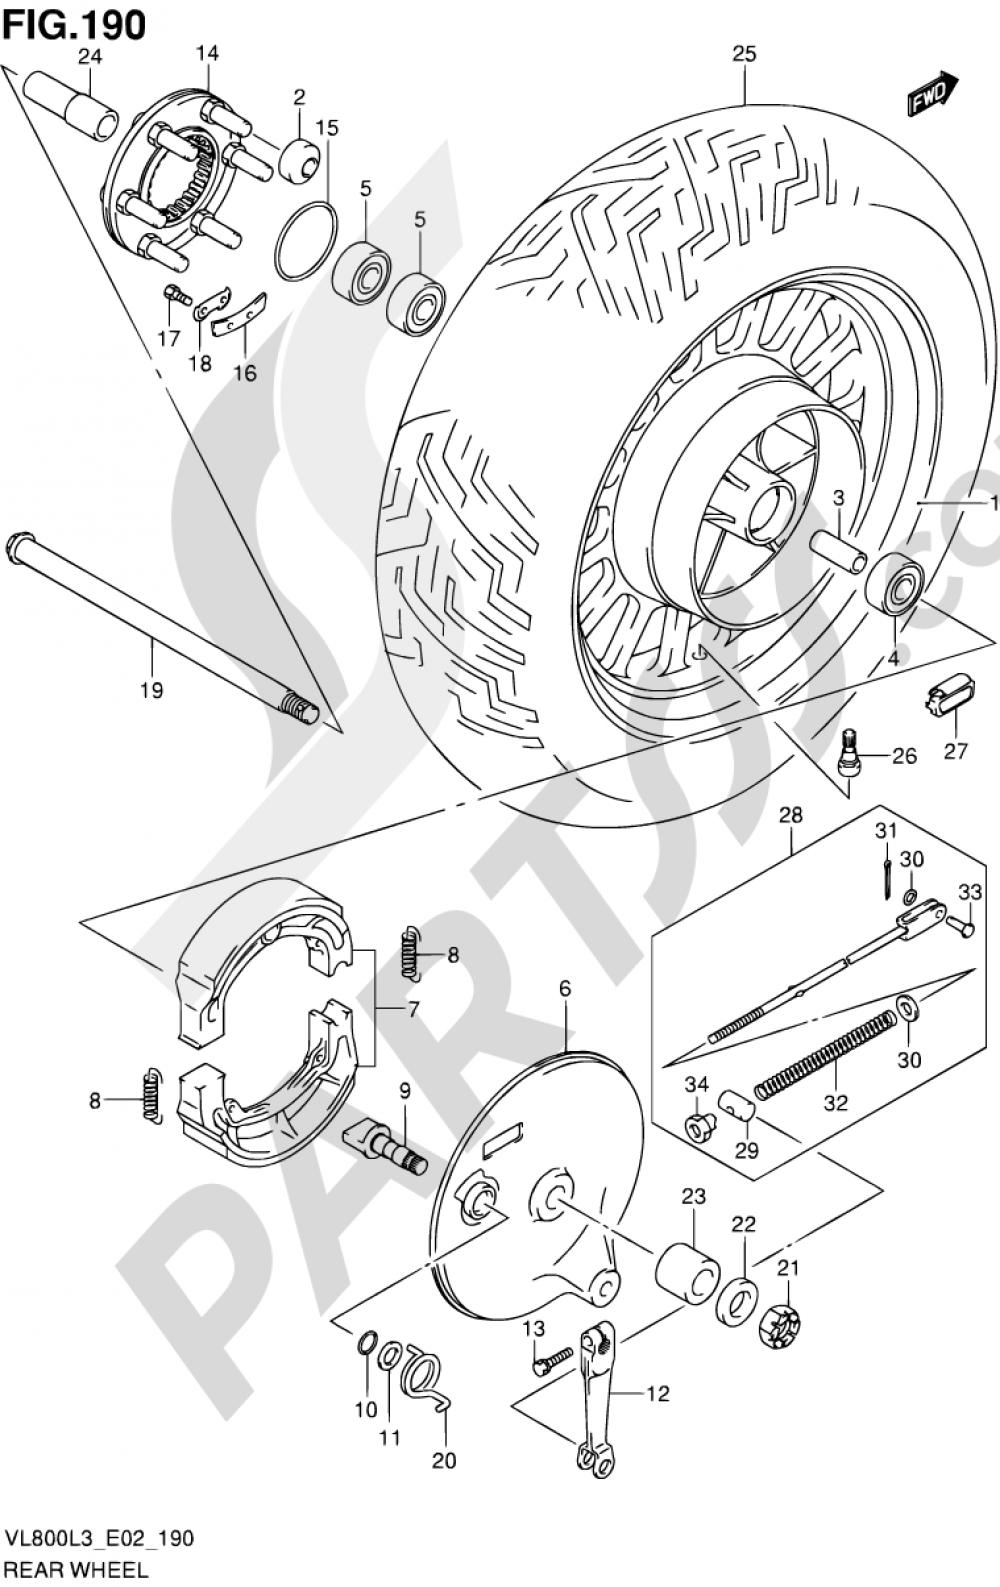 190 - REAR WHEEL (VL800CL3 E19) Suzuki INTRUDER VL800C 2013